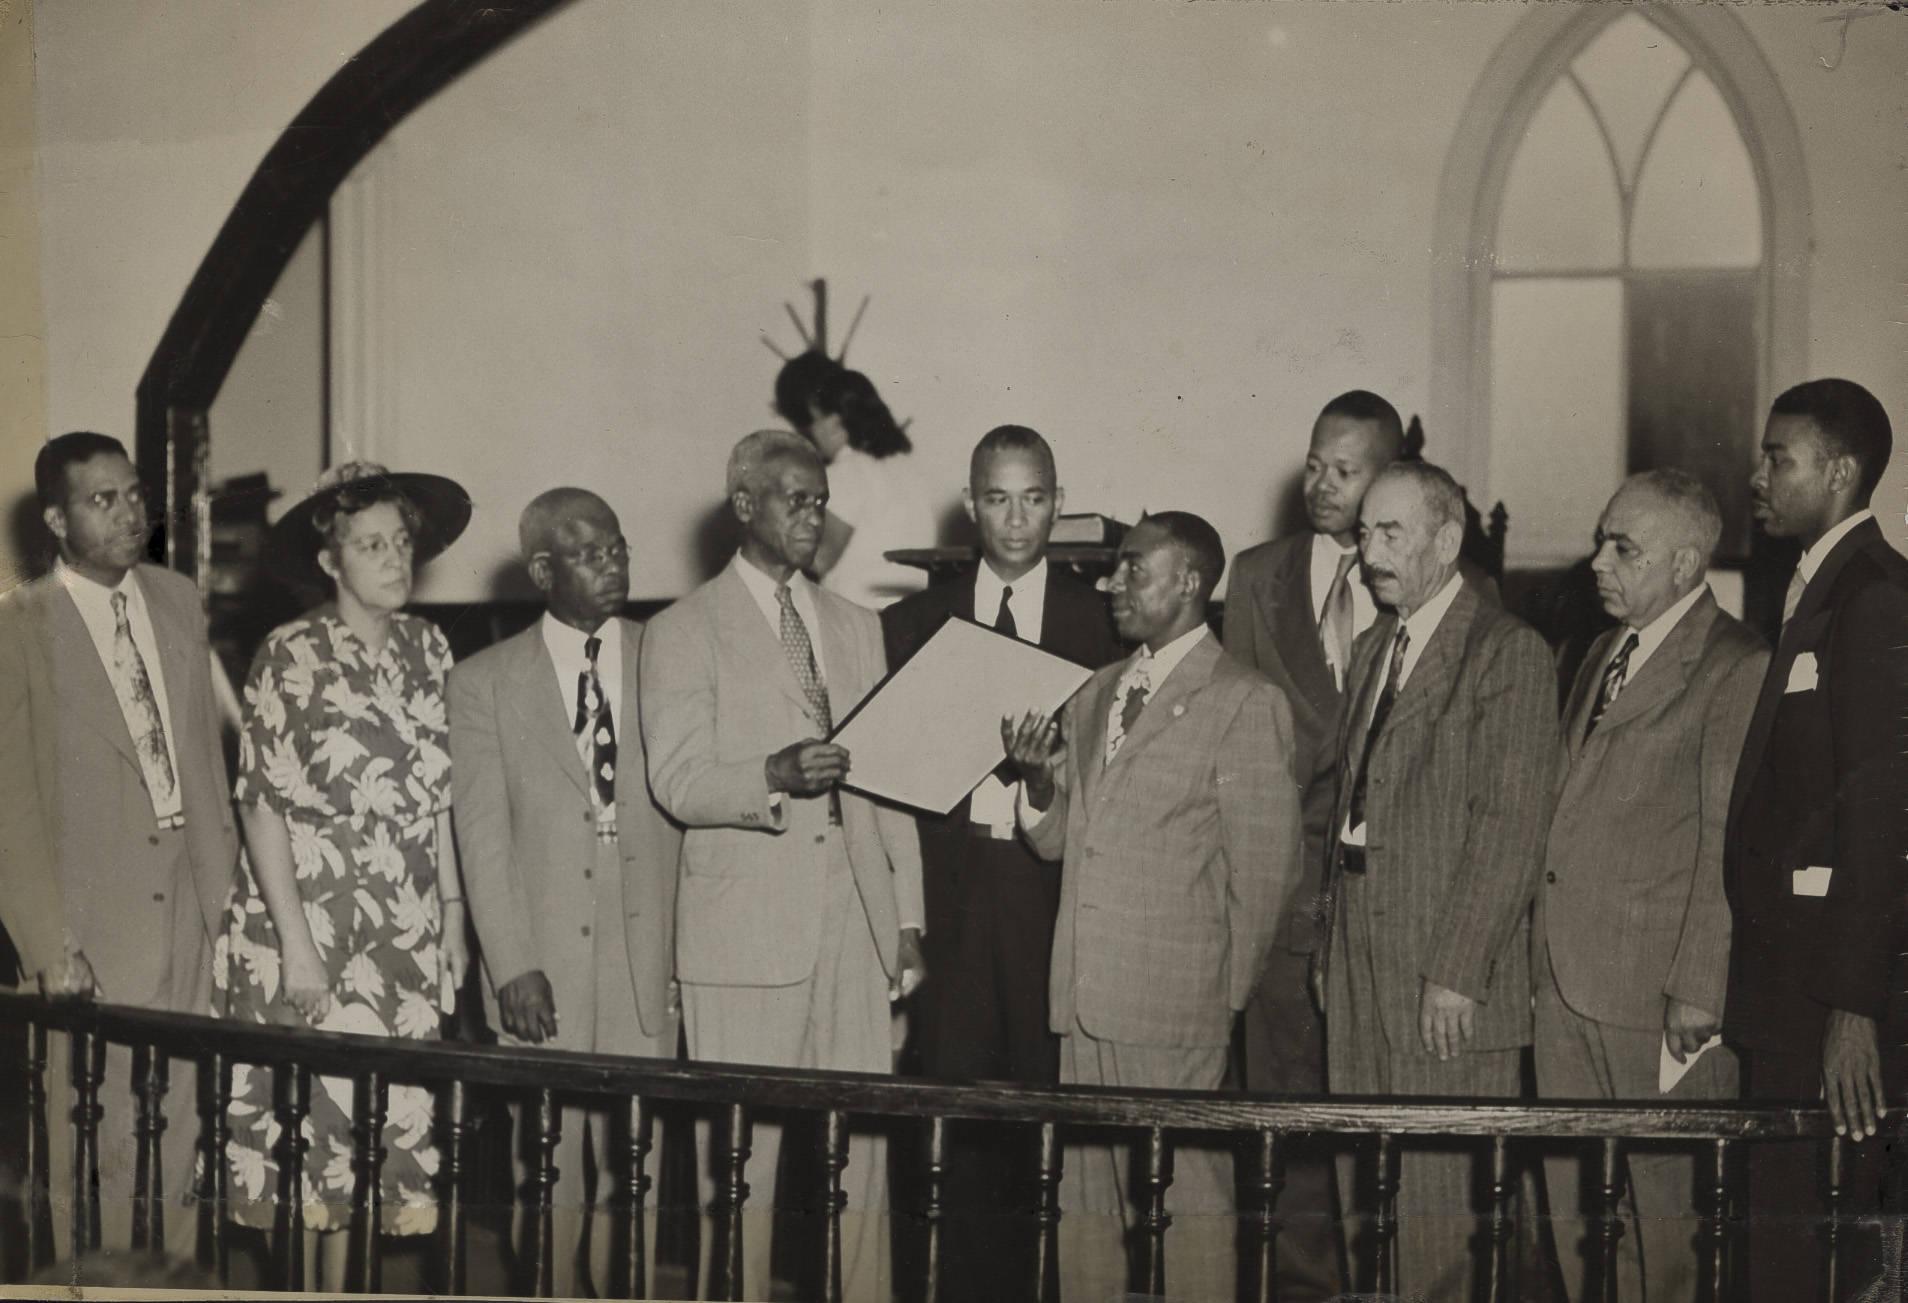 https://www.historiccolumbia.org/sites/default/files/album/2019-01/Photograph_1951_June_17_Clarendon_County_SC_EE_Richburg_Modjeska_Simkins_JW_Seals_Joseph_A_De_Laine_Sr_Harry_Briggs_John_McCray_JS_Flutie_Boyd_James_Hinton_and_Eugene_Montgomery.jpg